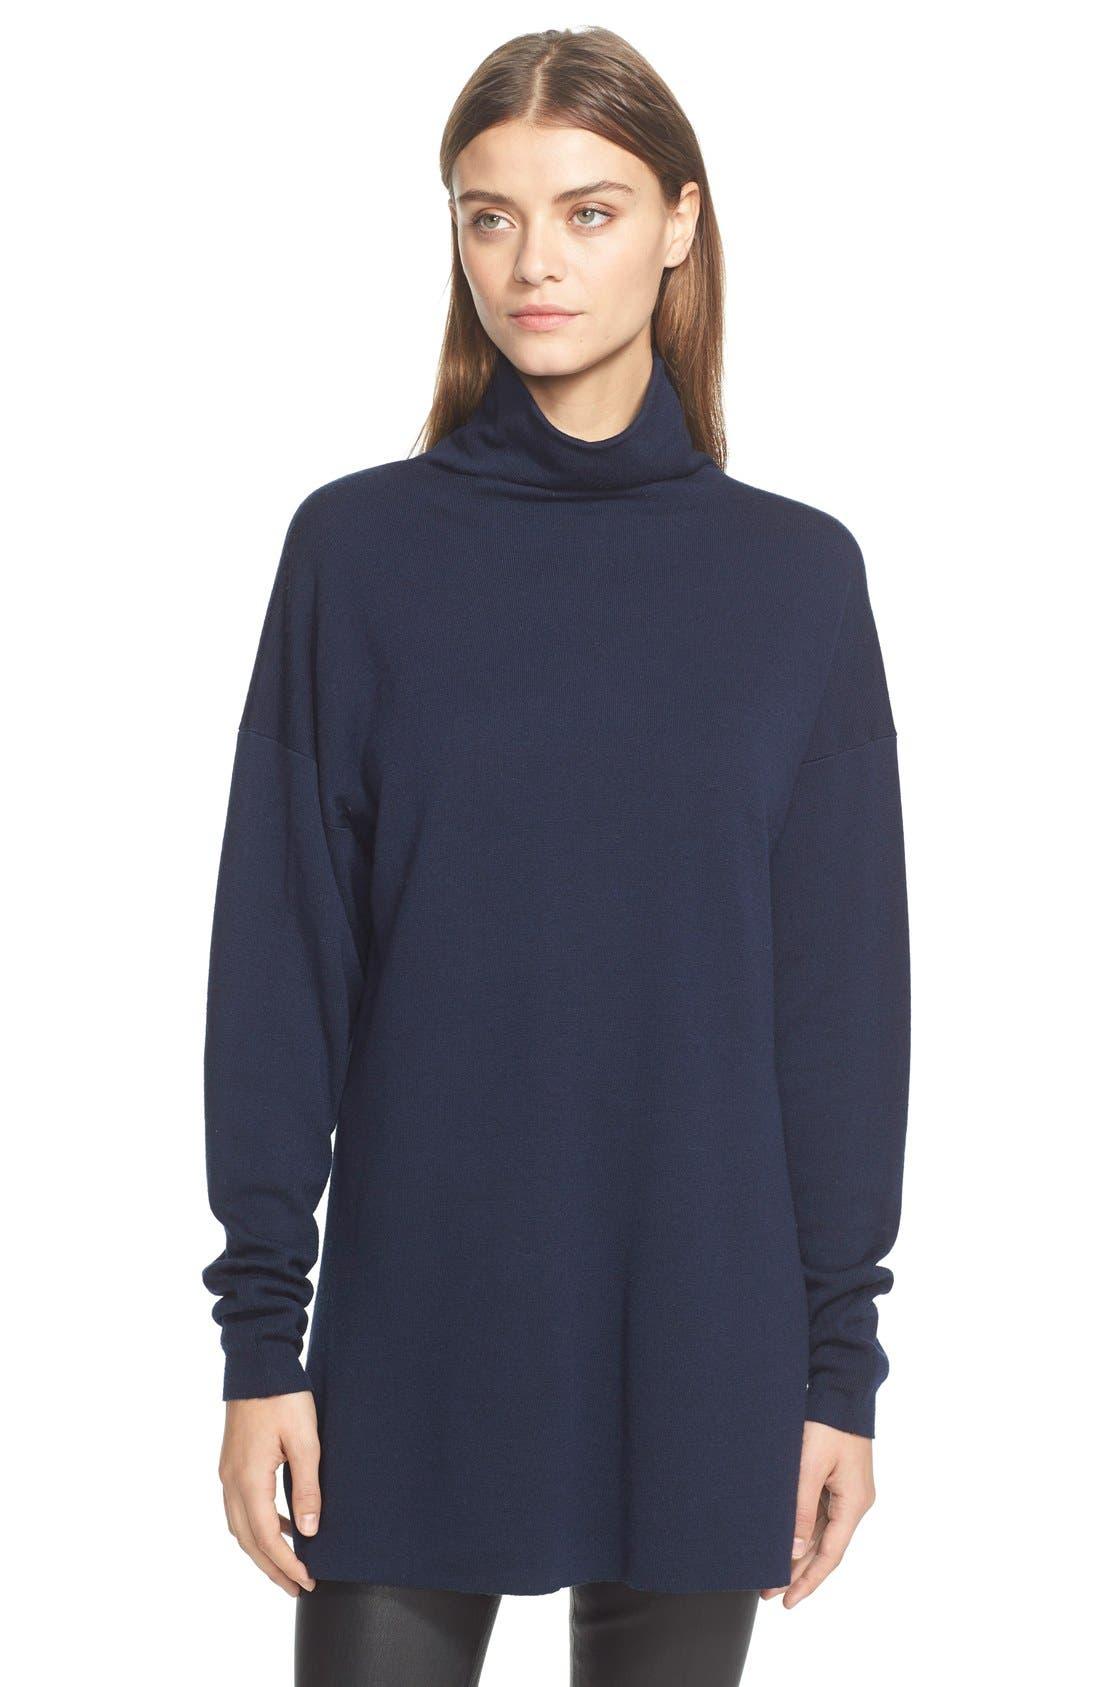 Turtleneck Sweater,                             Main thumbnail 1, color,                             402